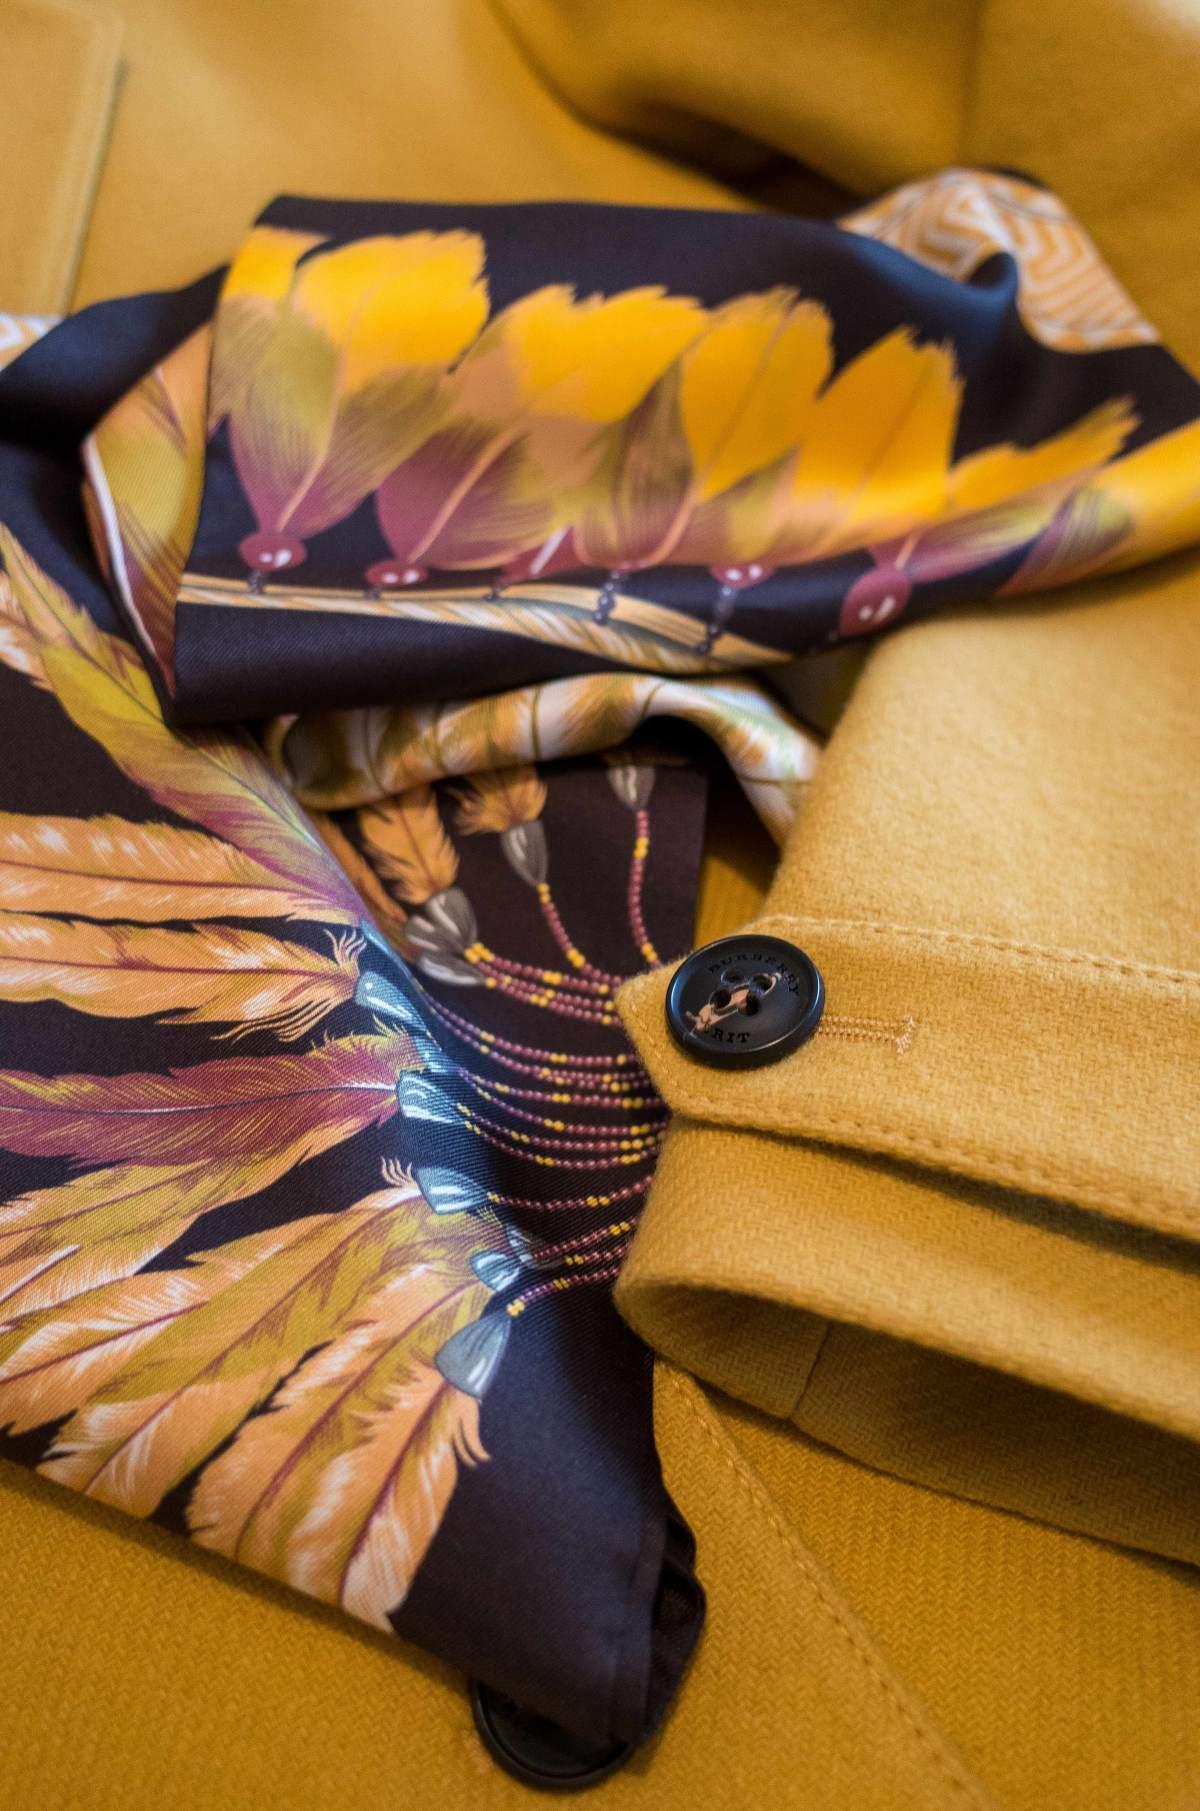 Hermes maxi twilly, Hermes scarf, Hermes Brazil, Burberry coat